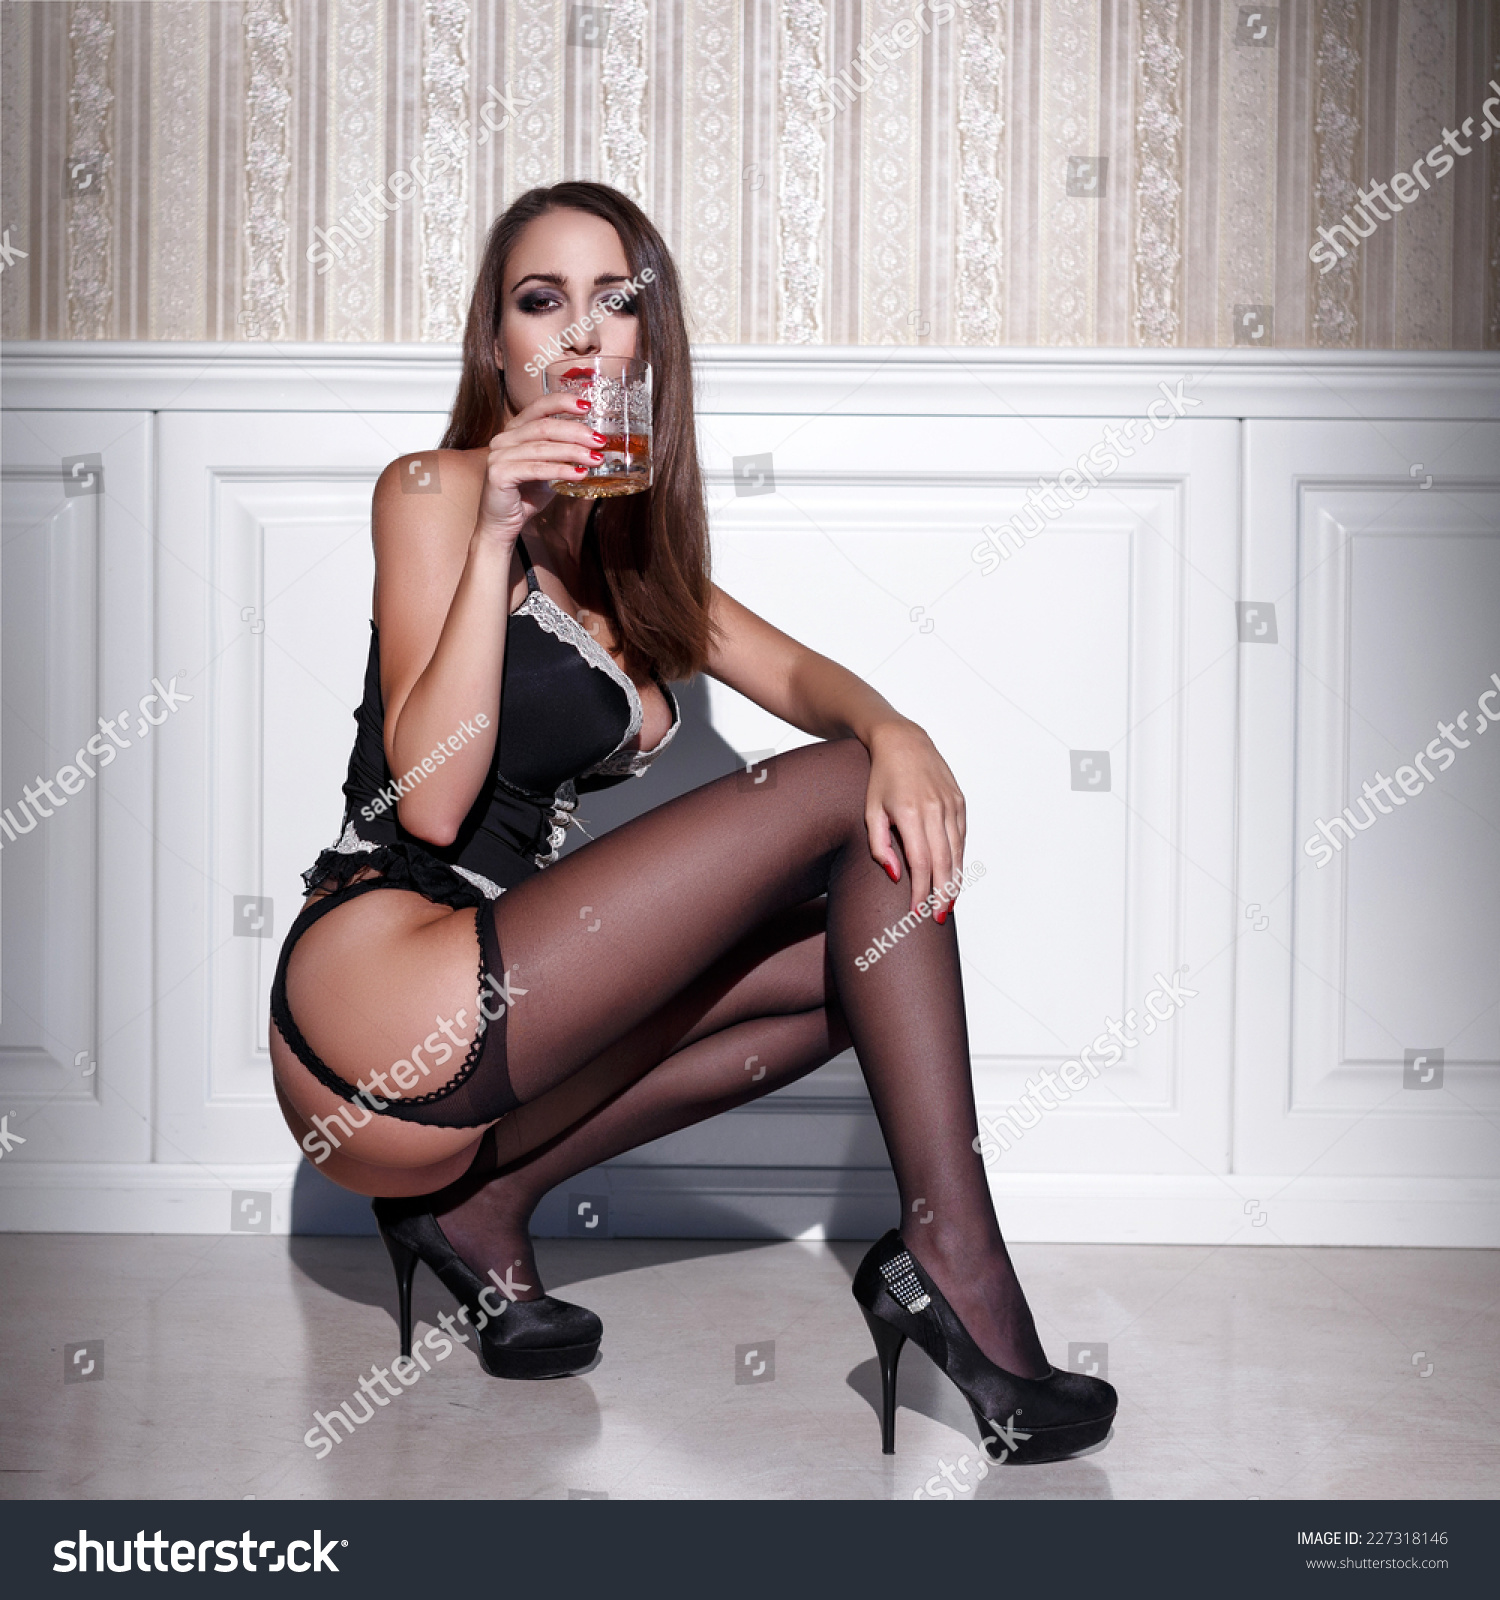 Sexy Woman Corset Stockings Squat Whiskey Stock Photo Edit Now 227318146